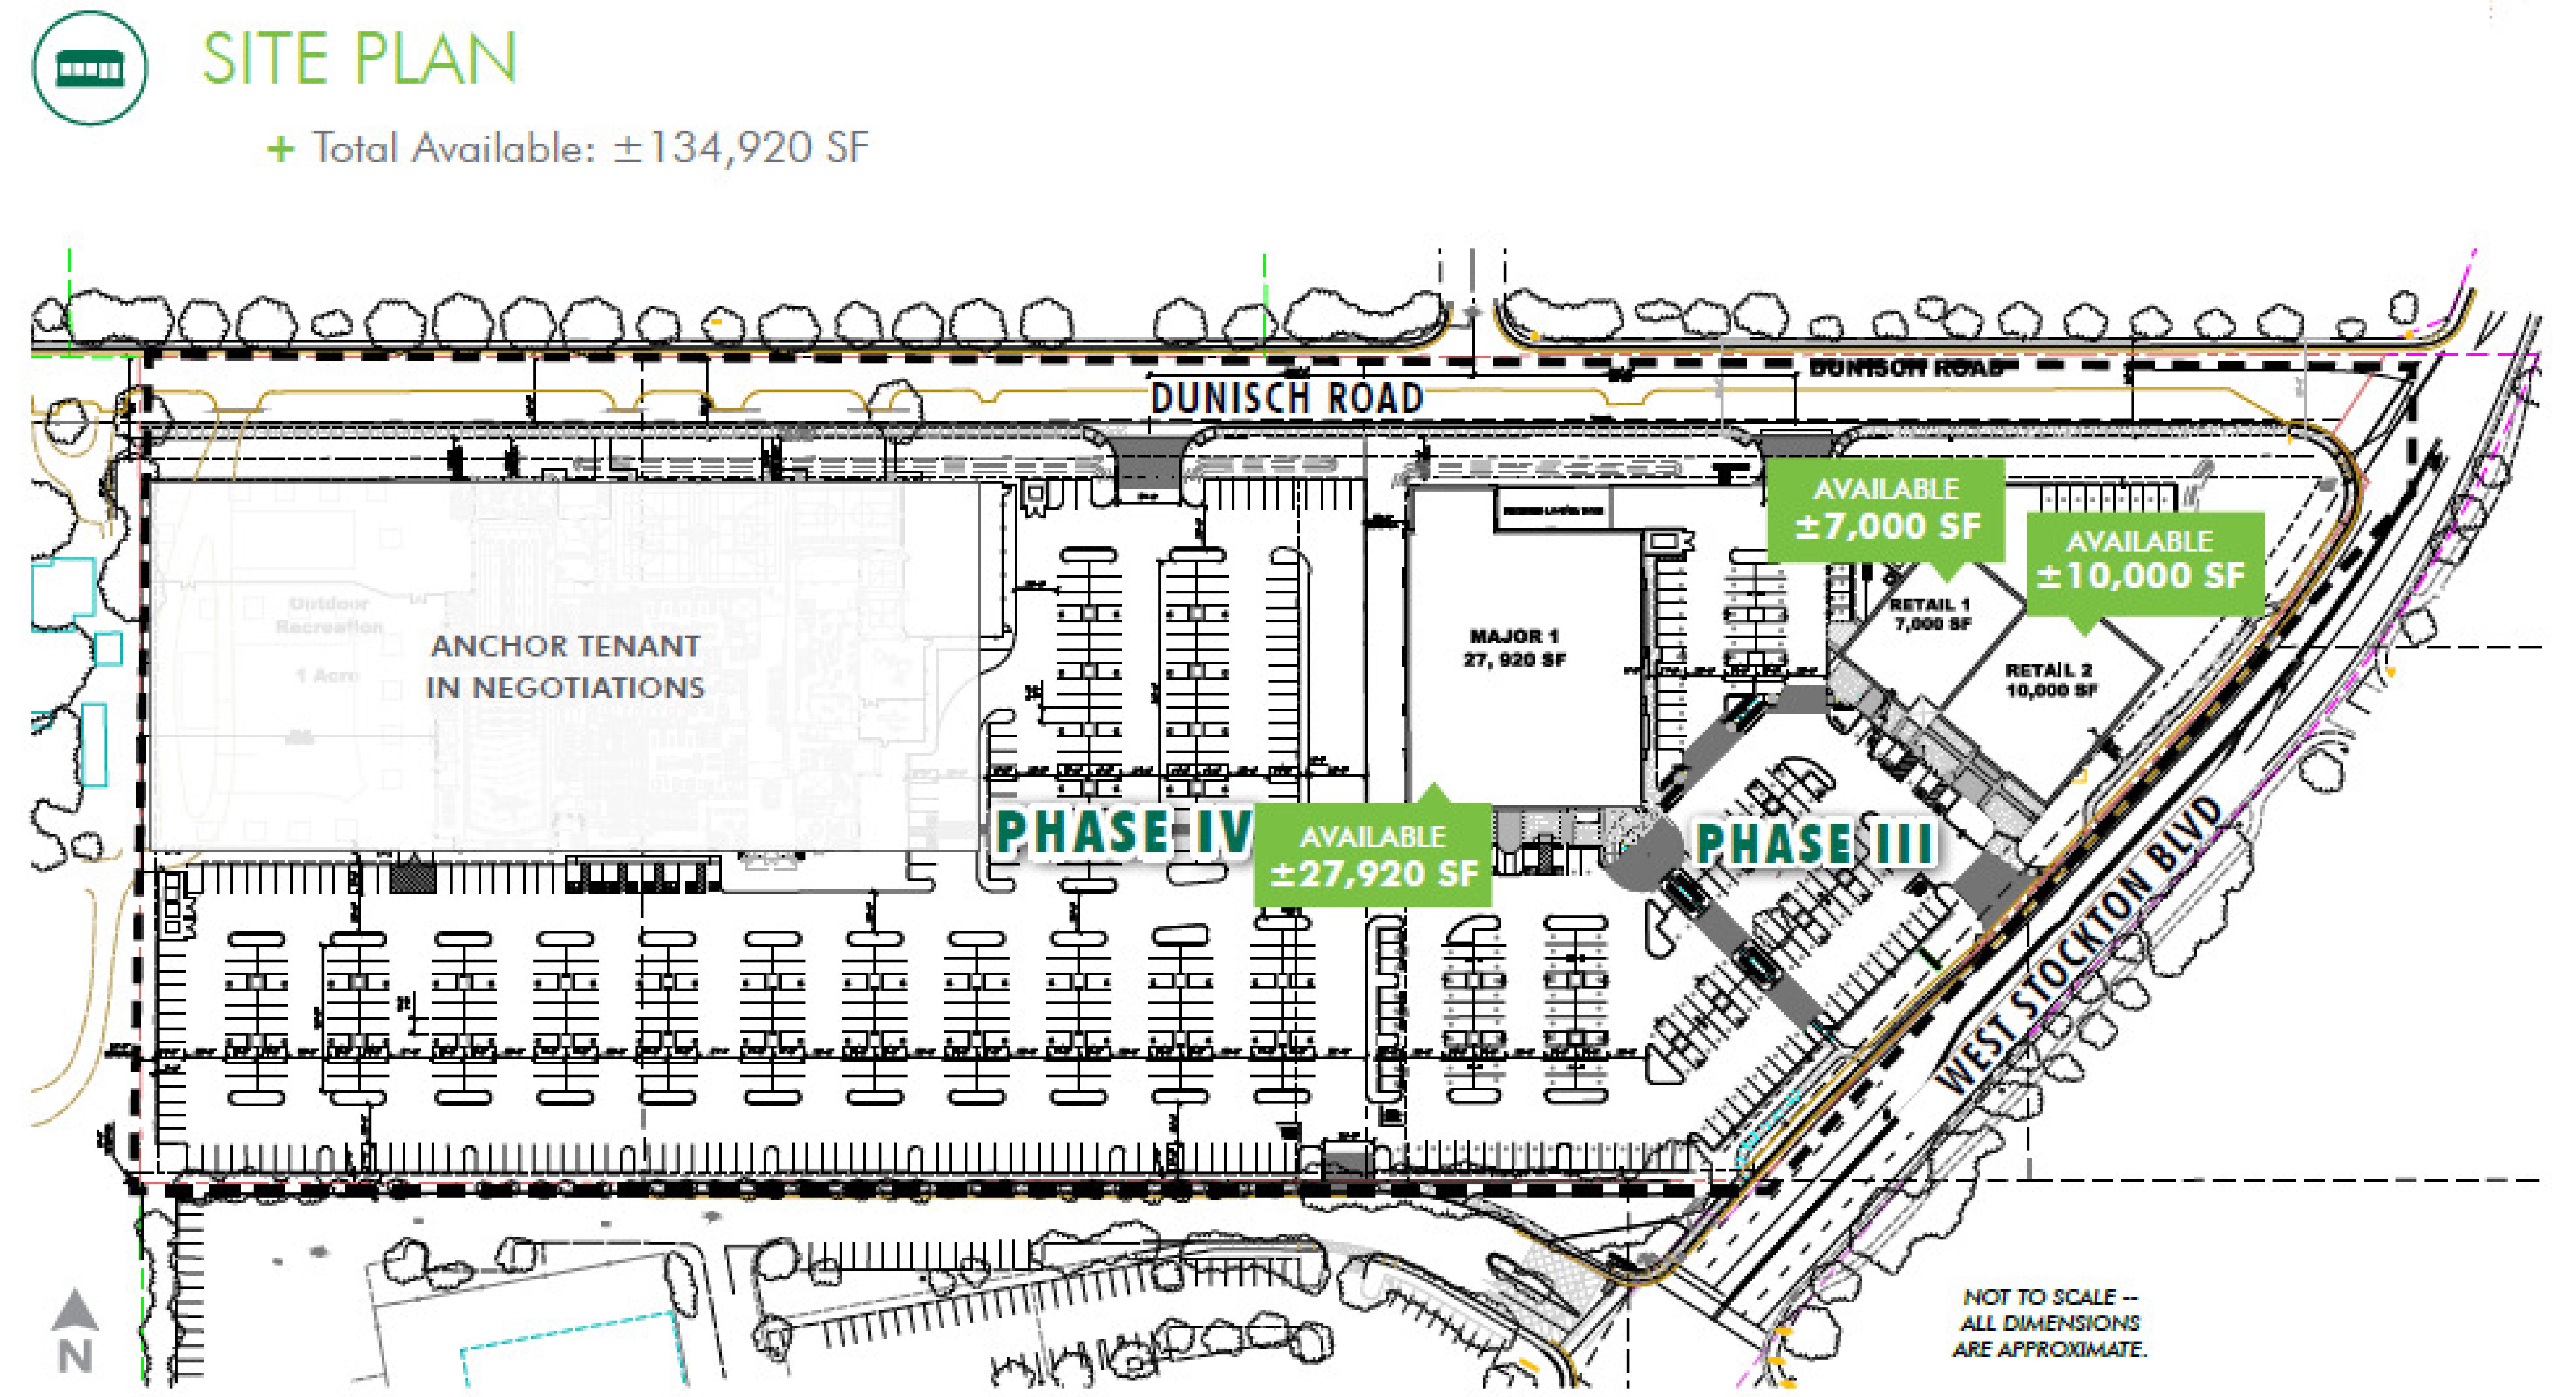 Laguna Gateway, Phase III & IV: site plan